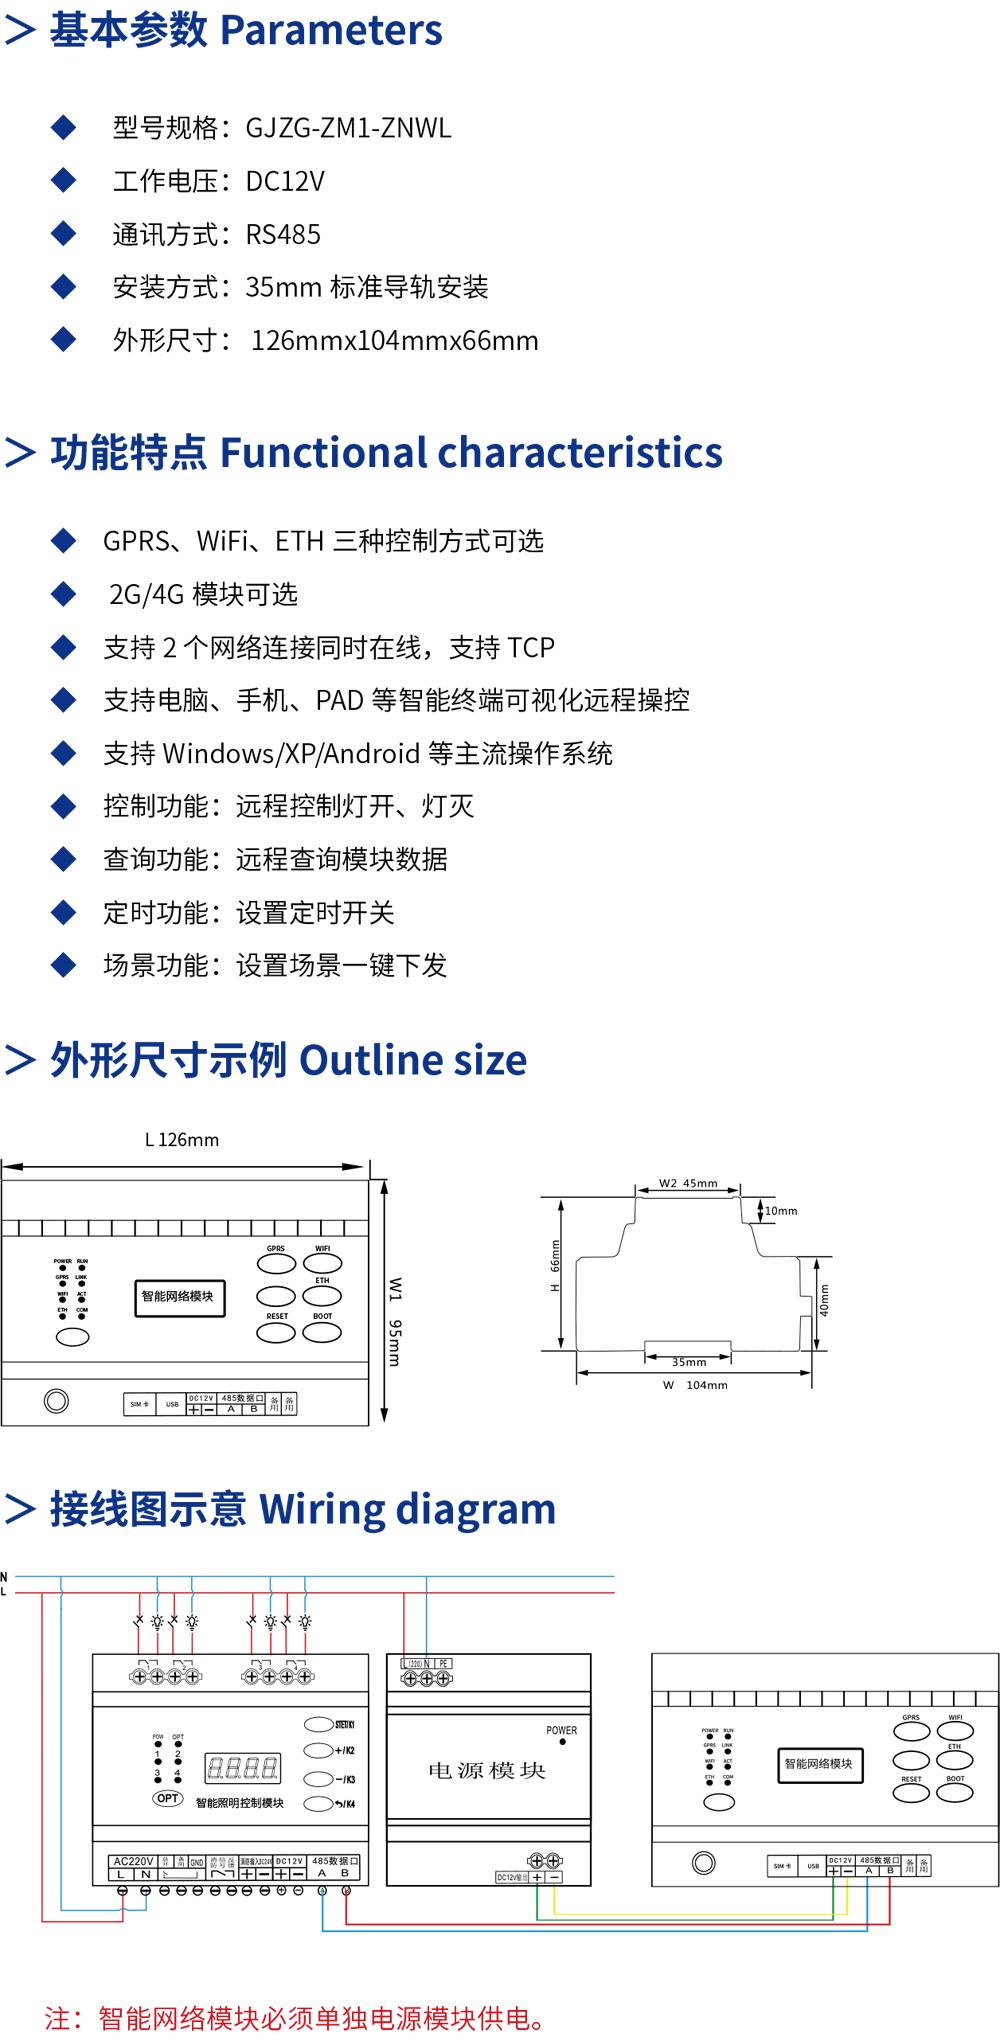 GJZG-ZM1-ZNWL-智能網絡模塊詳情.jpg